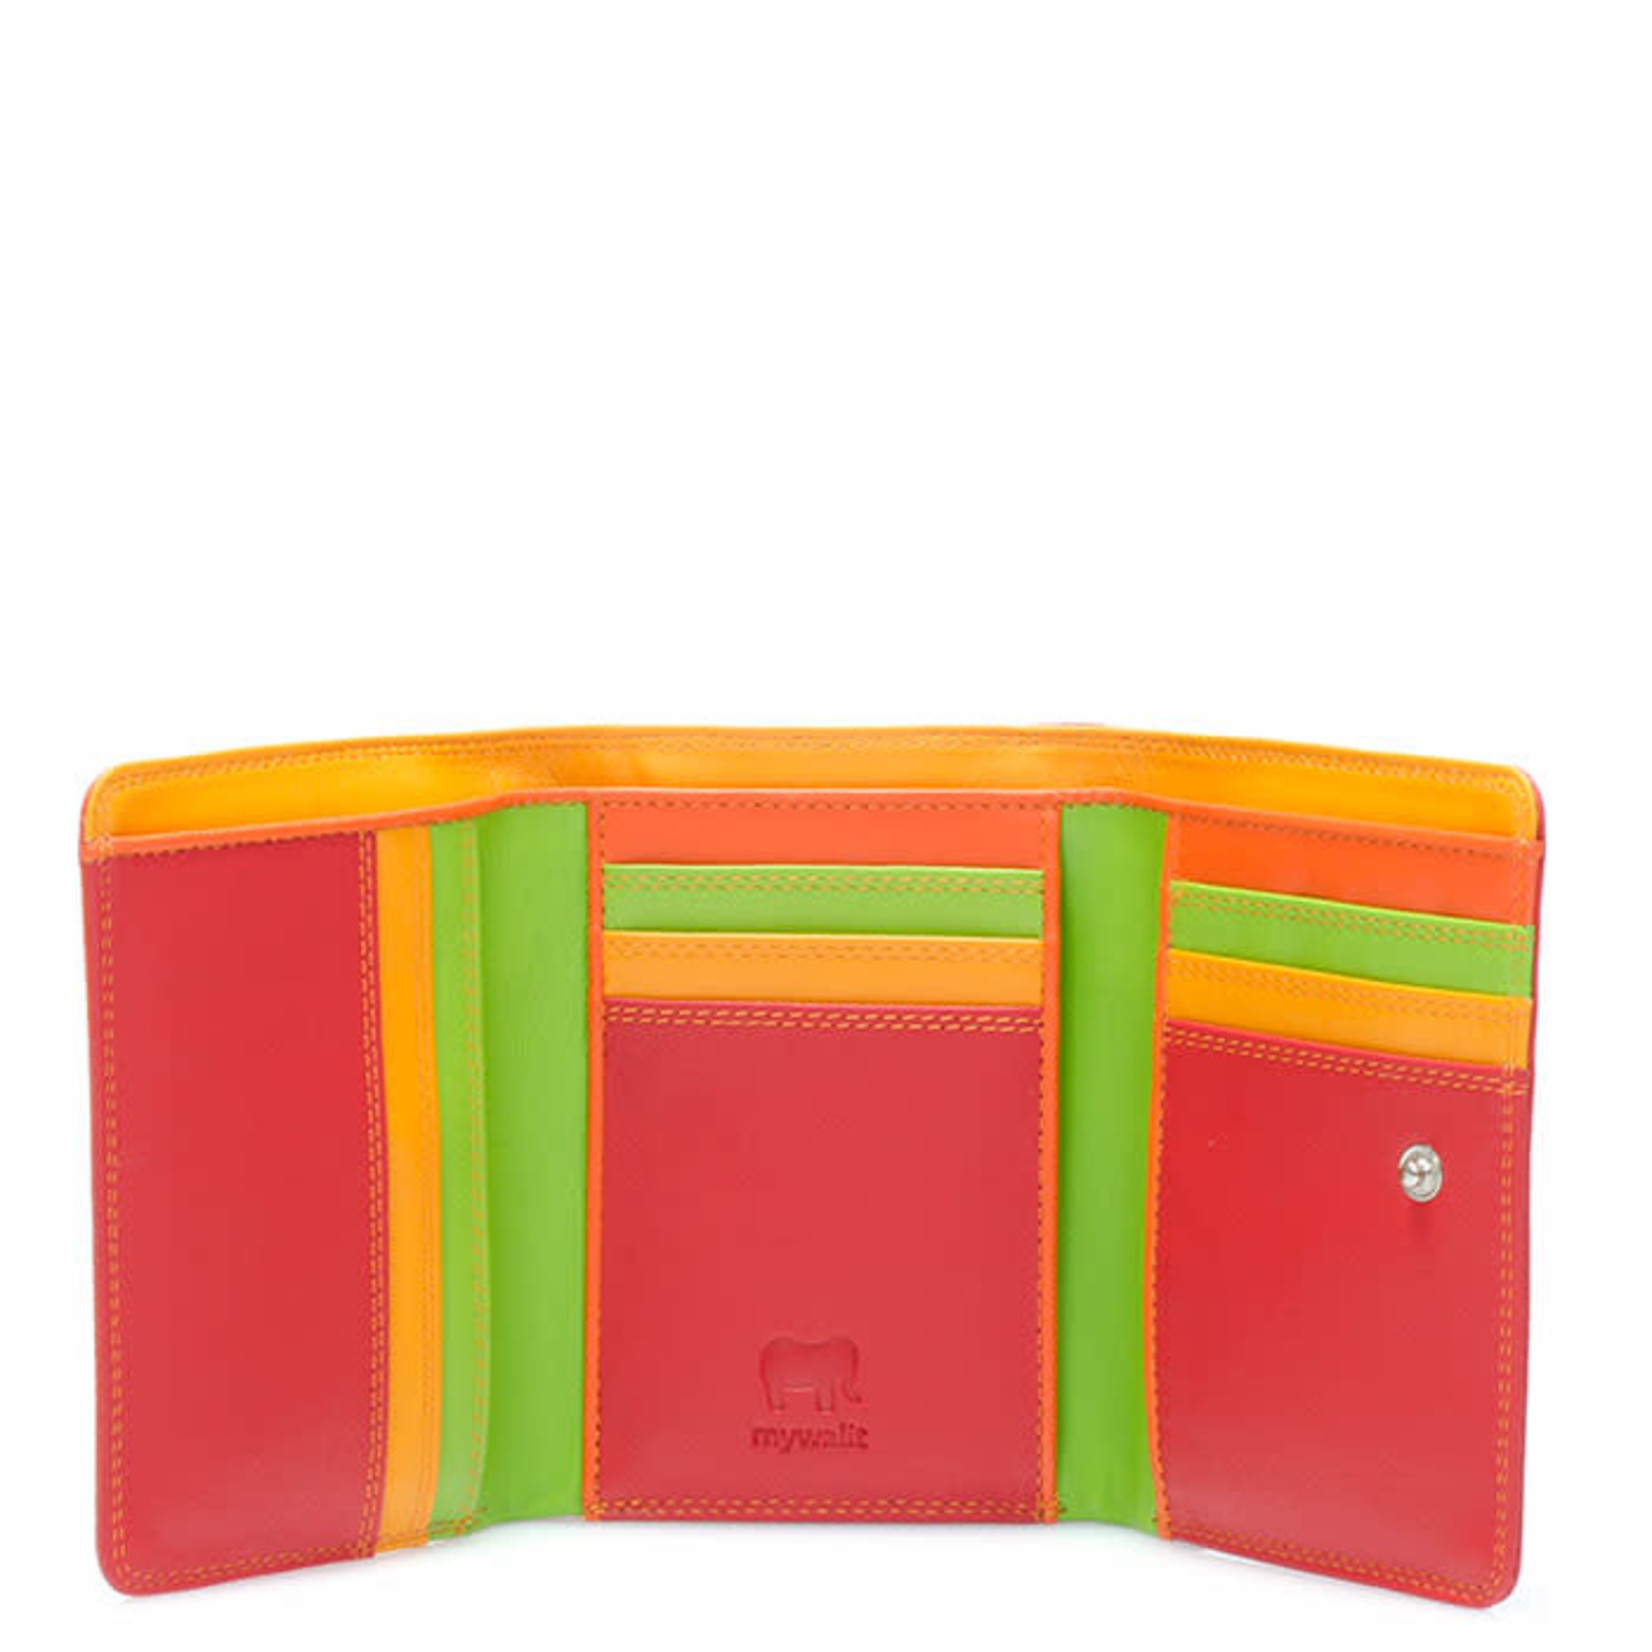 MyWalit Medium Tri-fold Wallet Jamacia